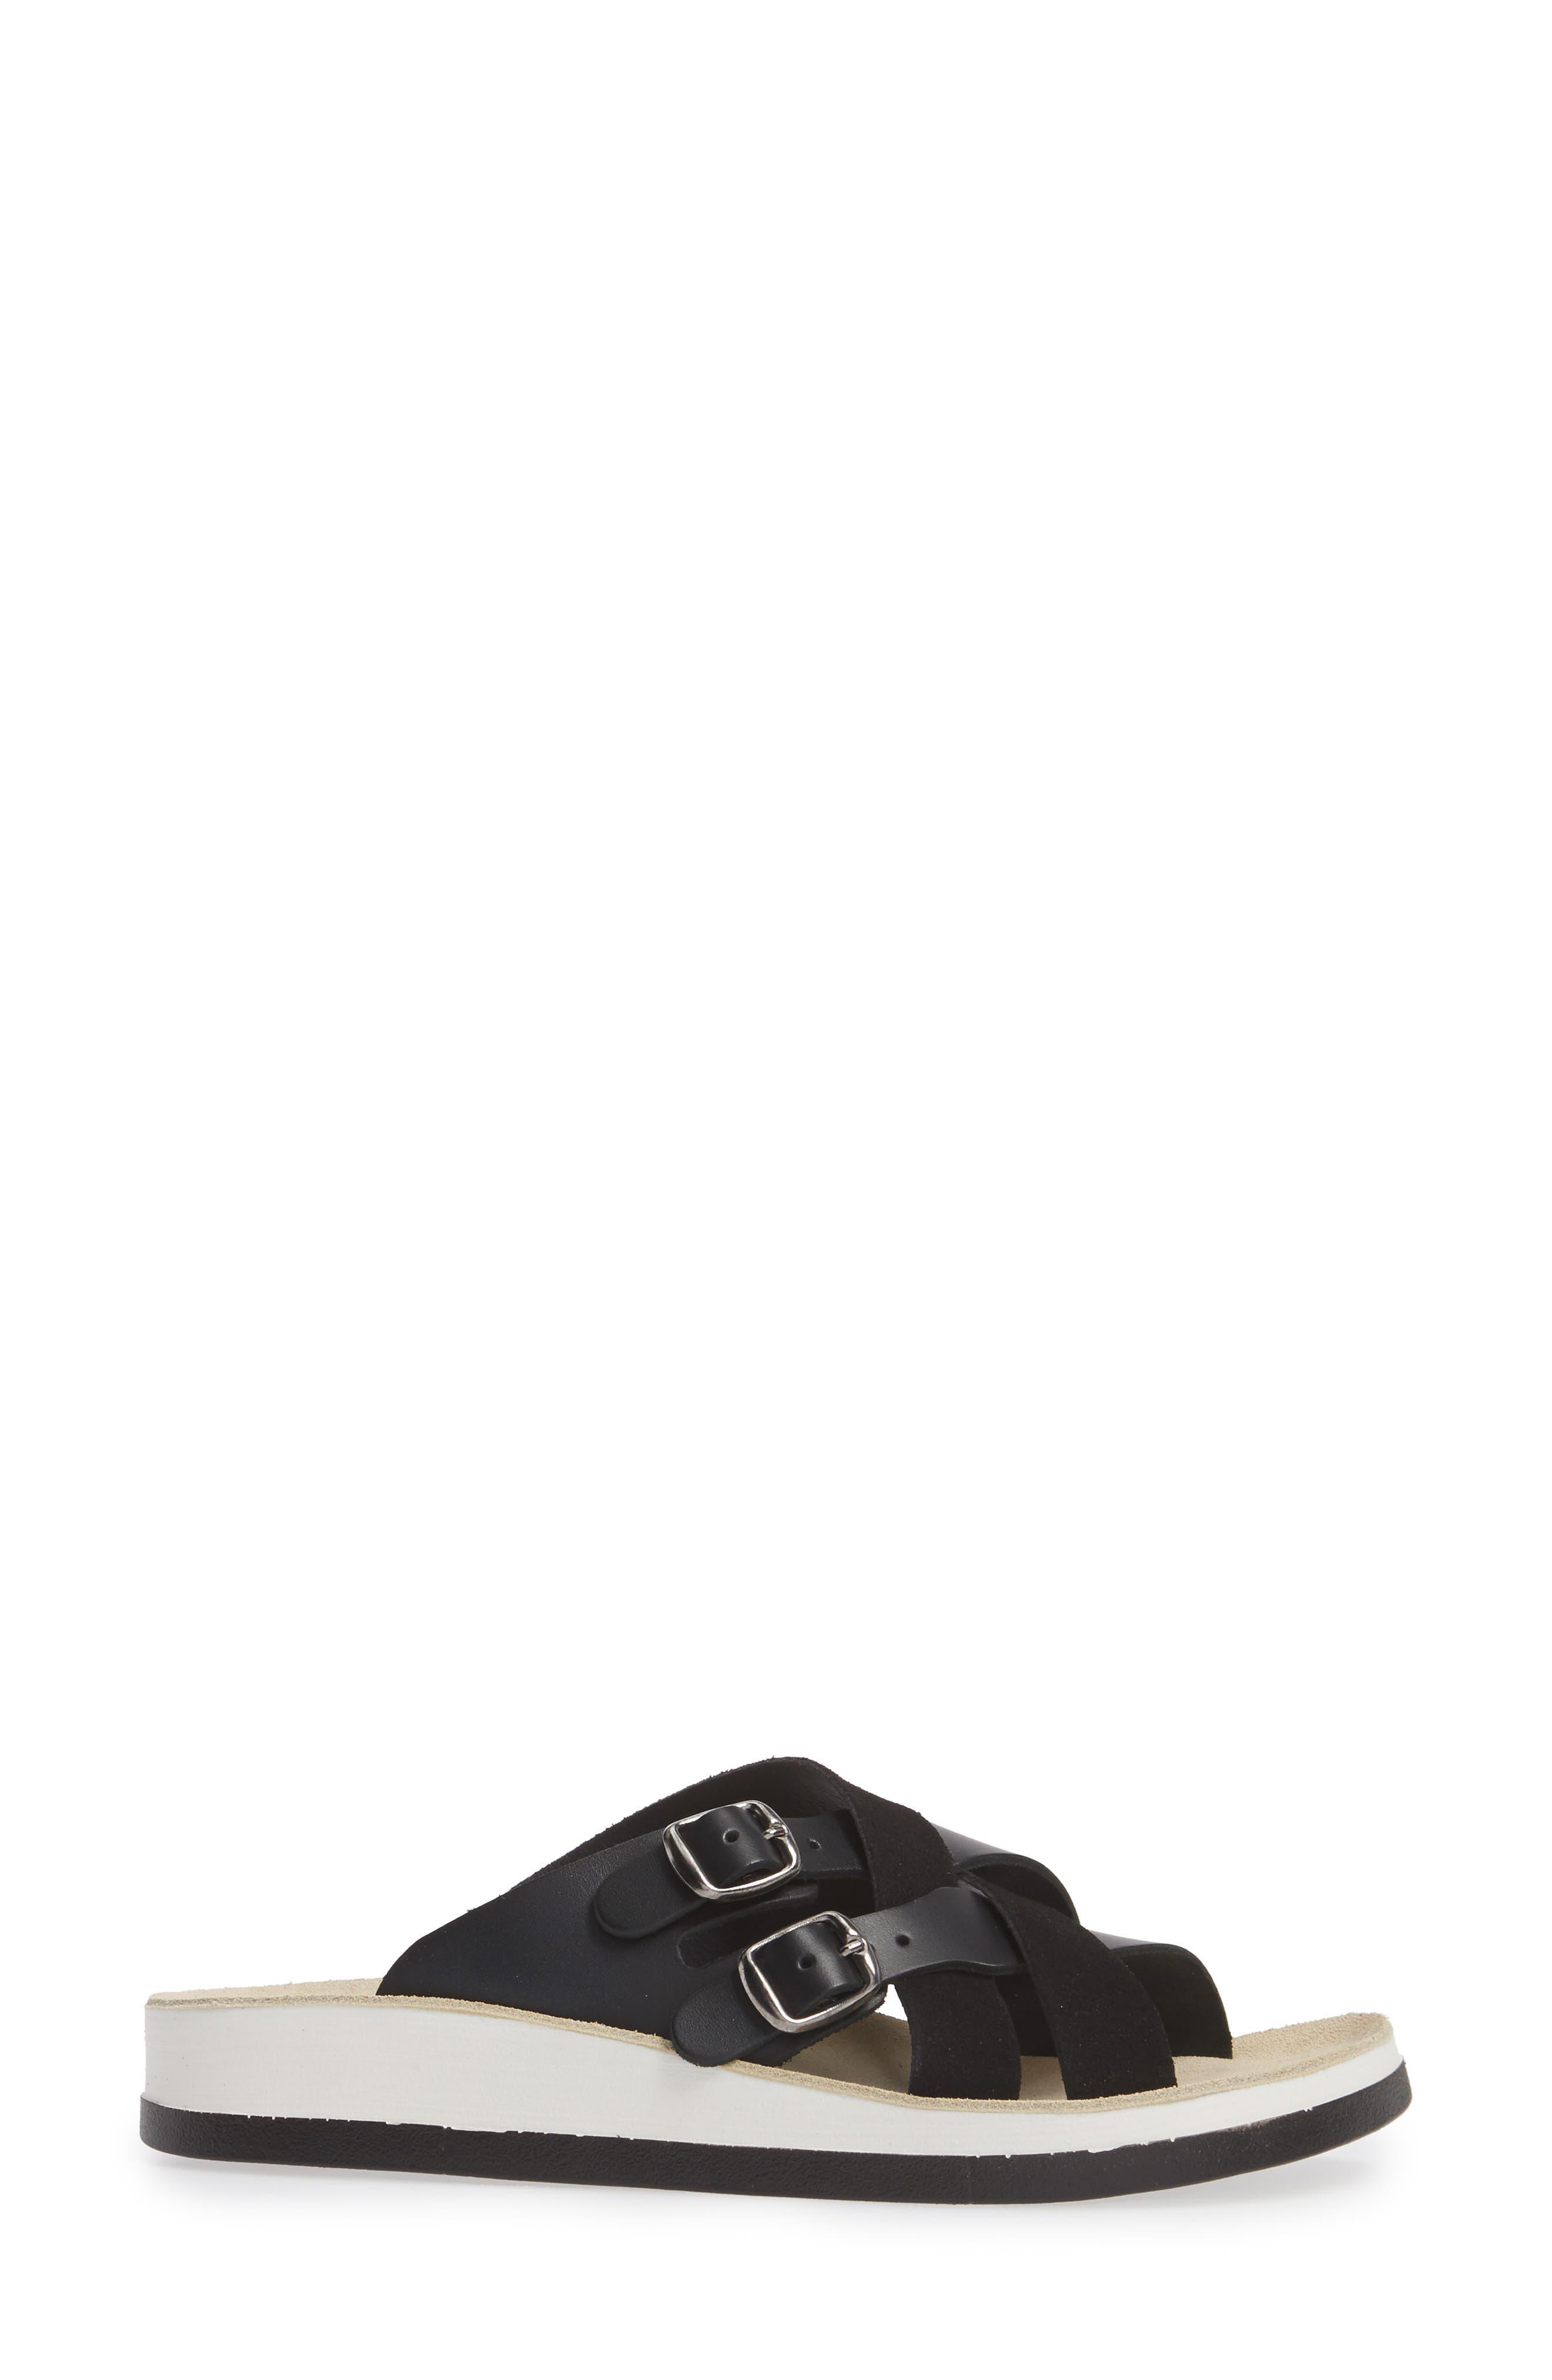 Silvia Slide Sandal,                             Alternate thumbnail 3, color,                             BLACK LEATHER